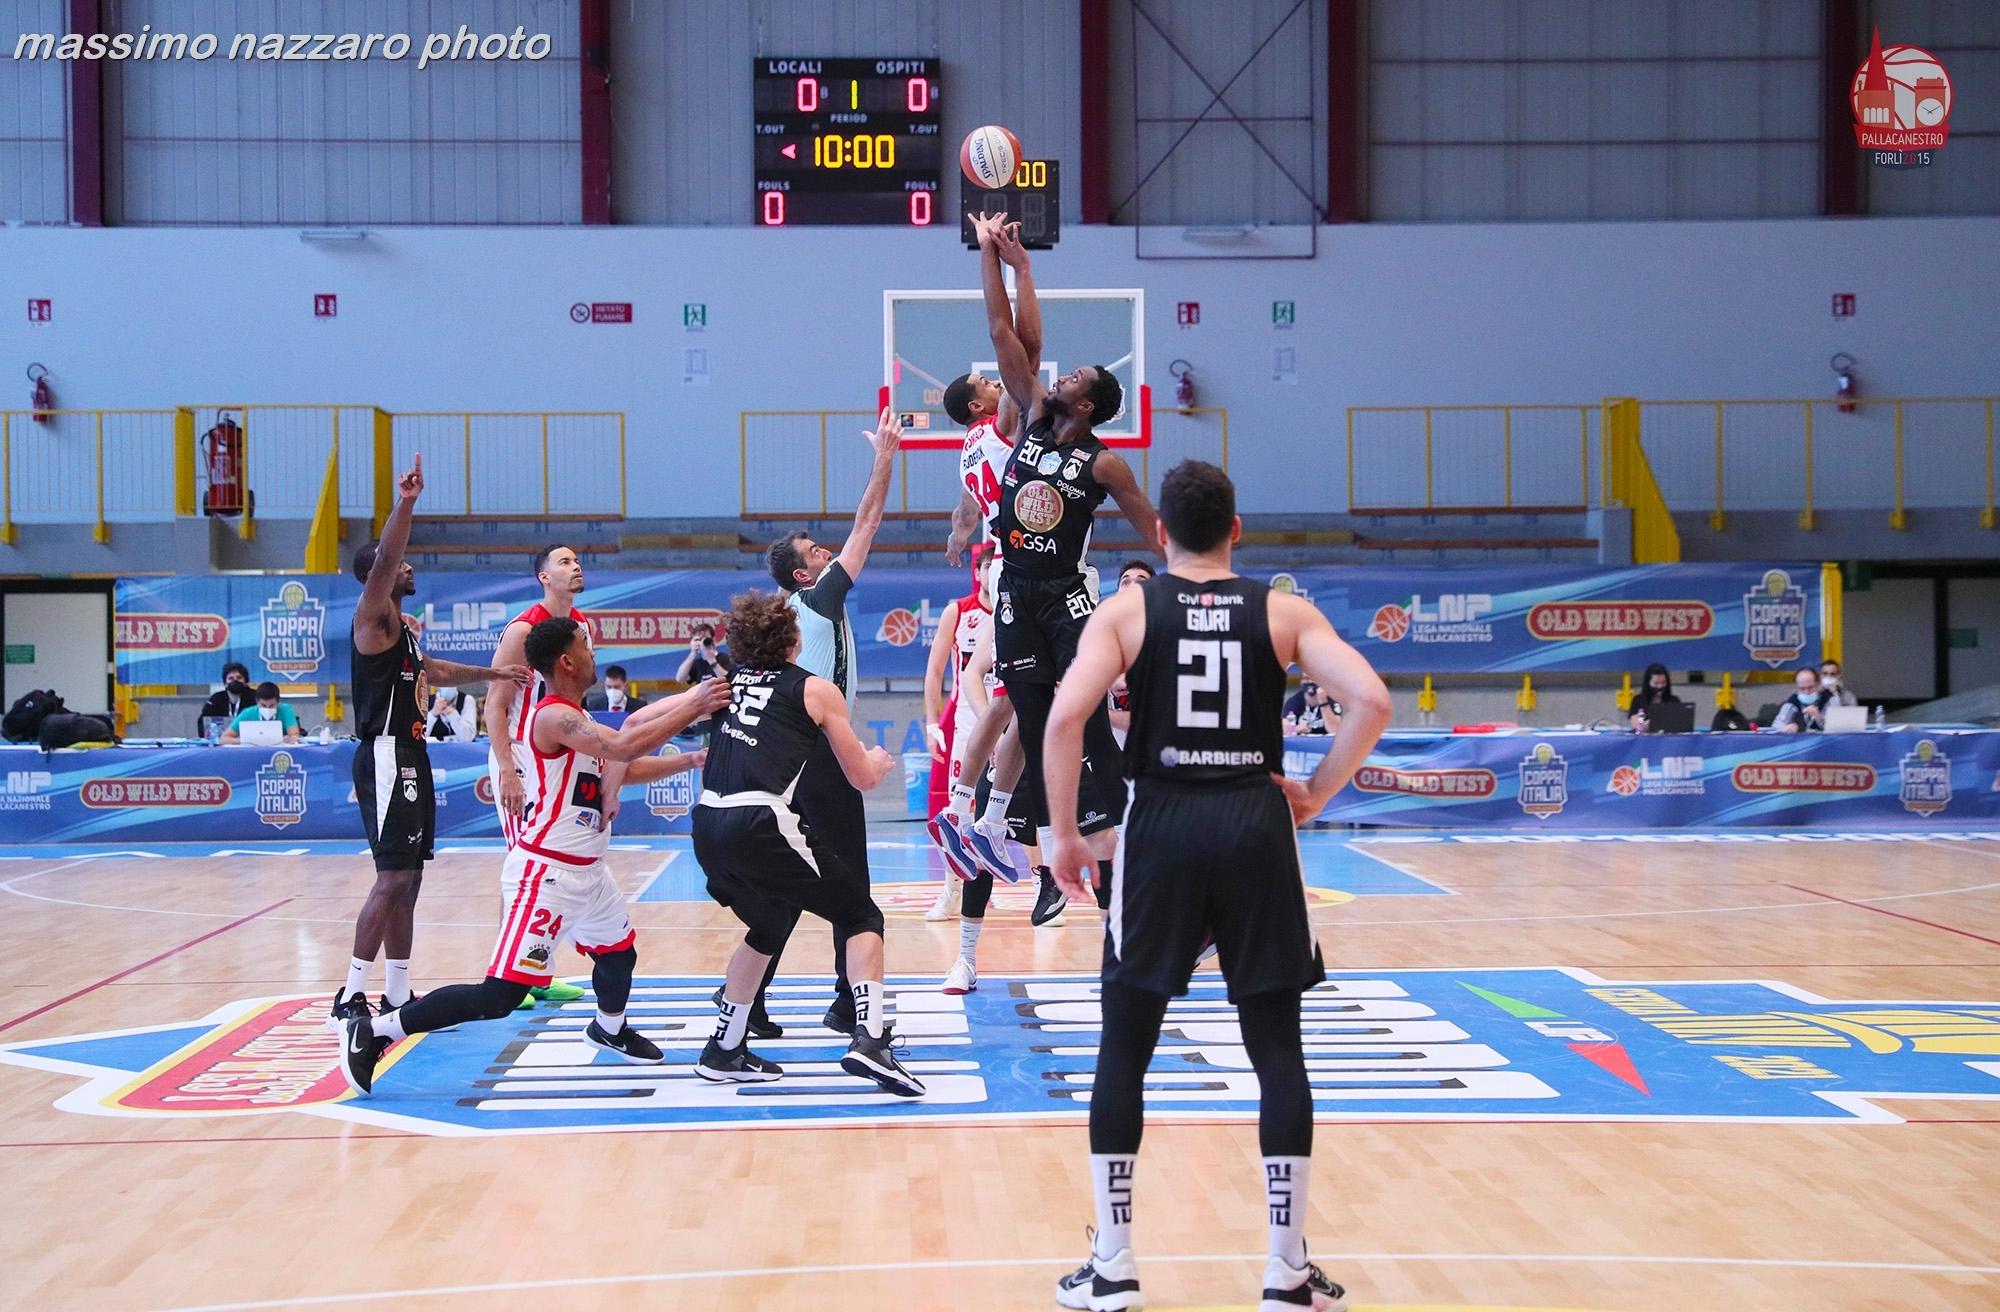 Basket-Unieuro-Udine-coppa-Italia